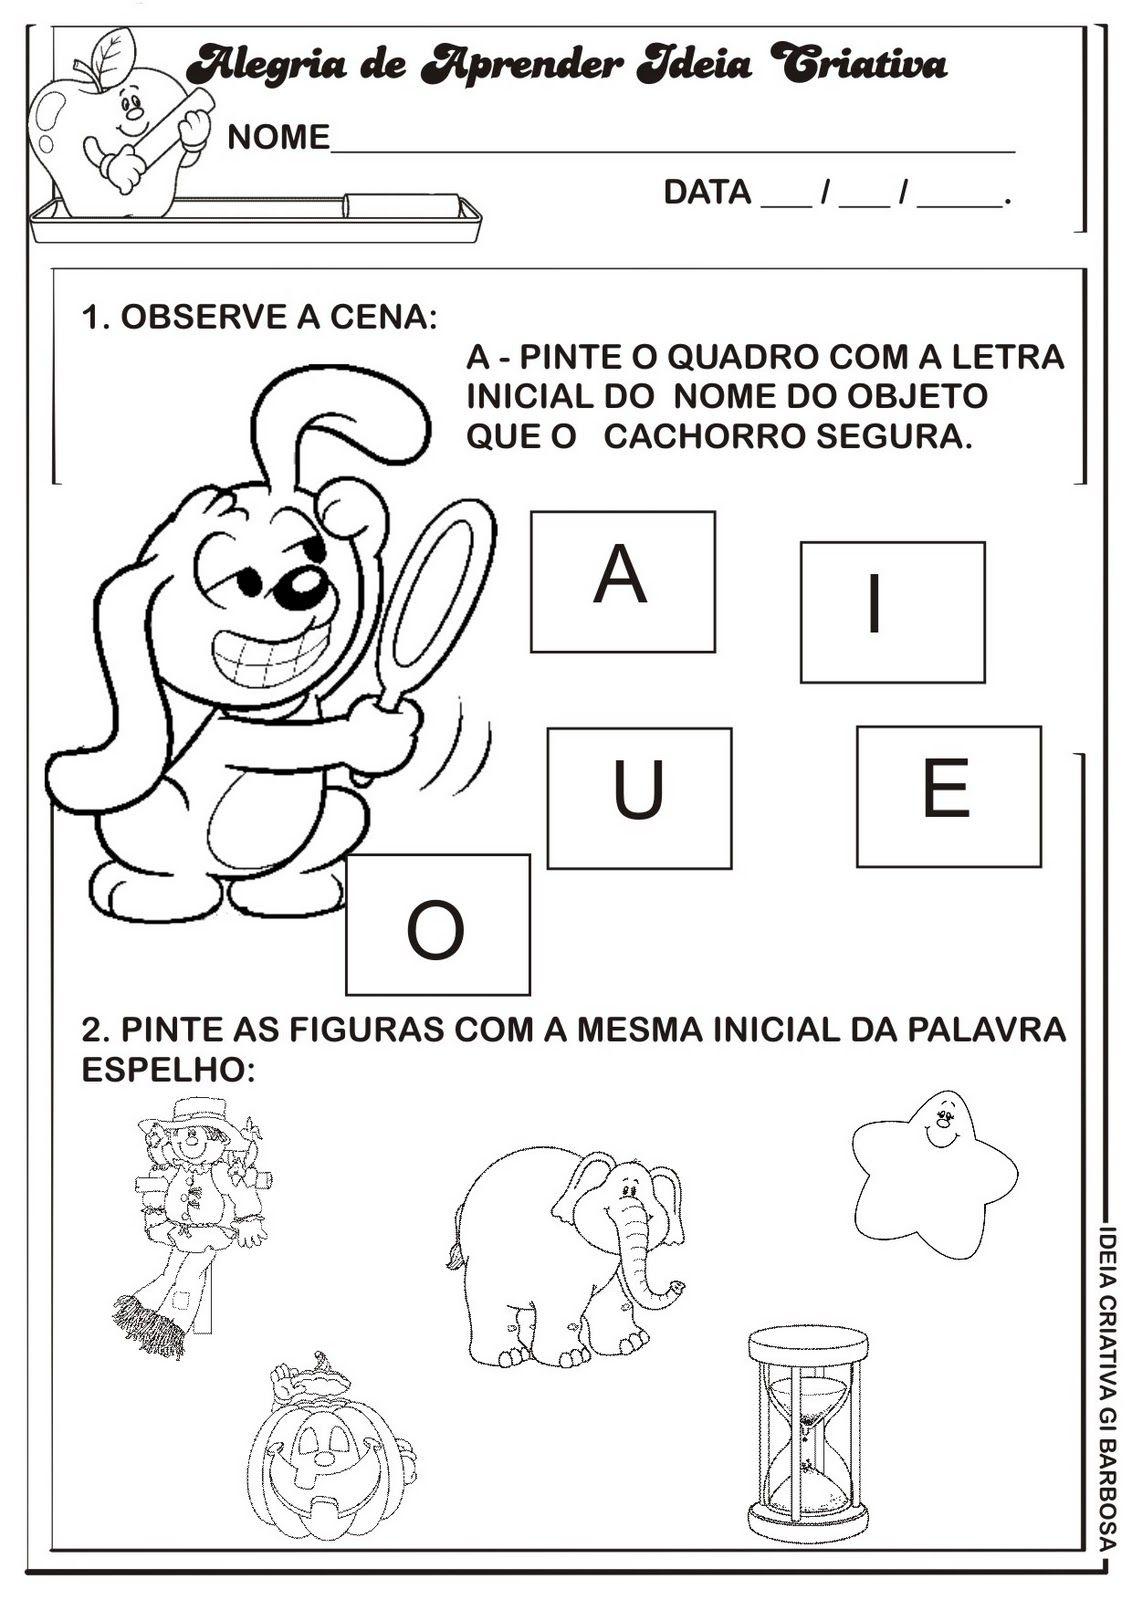 Fabuloso Atividade Letra E Ideia Criativa Gi Barbosa | Escola | Pinterest  QY82